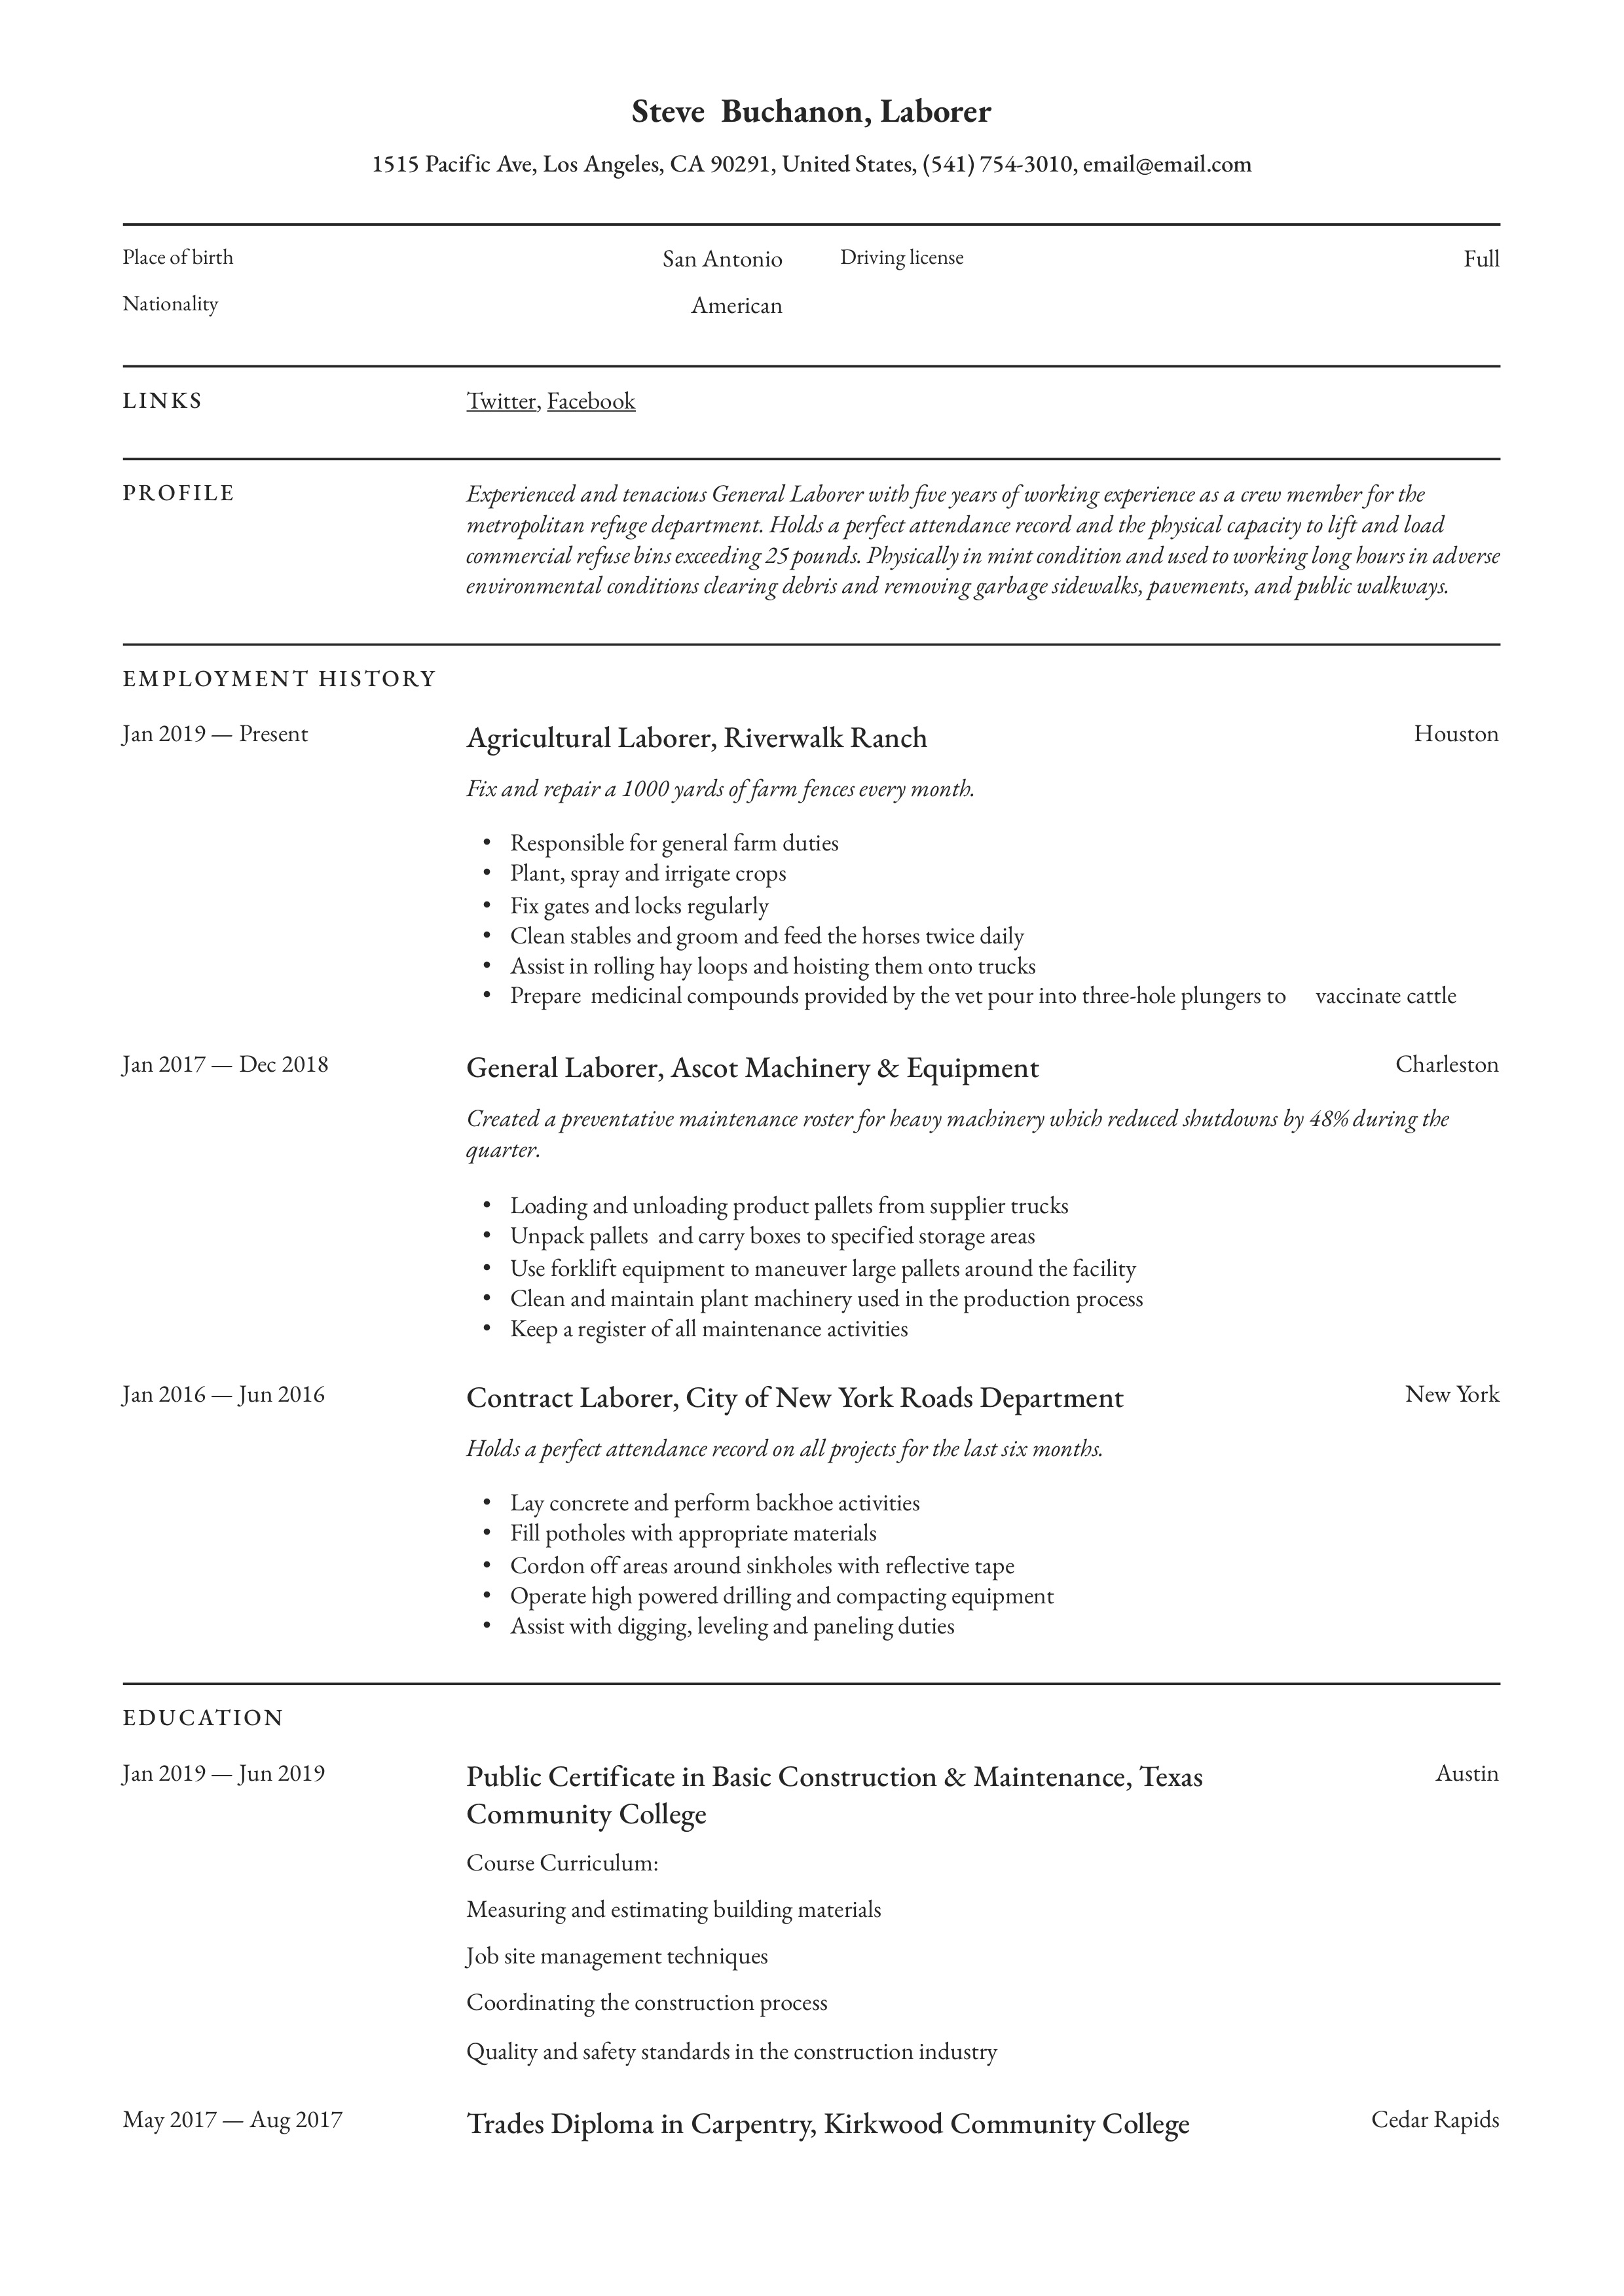 Resume Example General Laborer